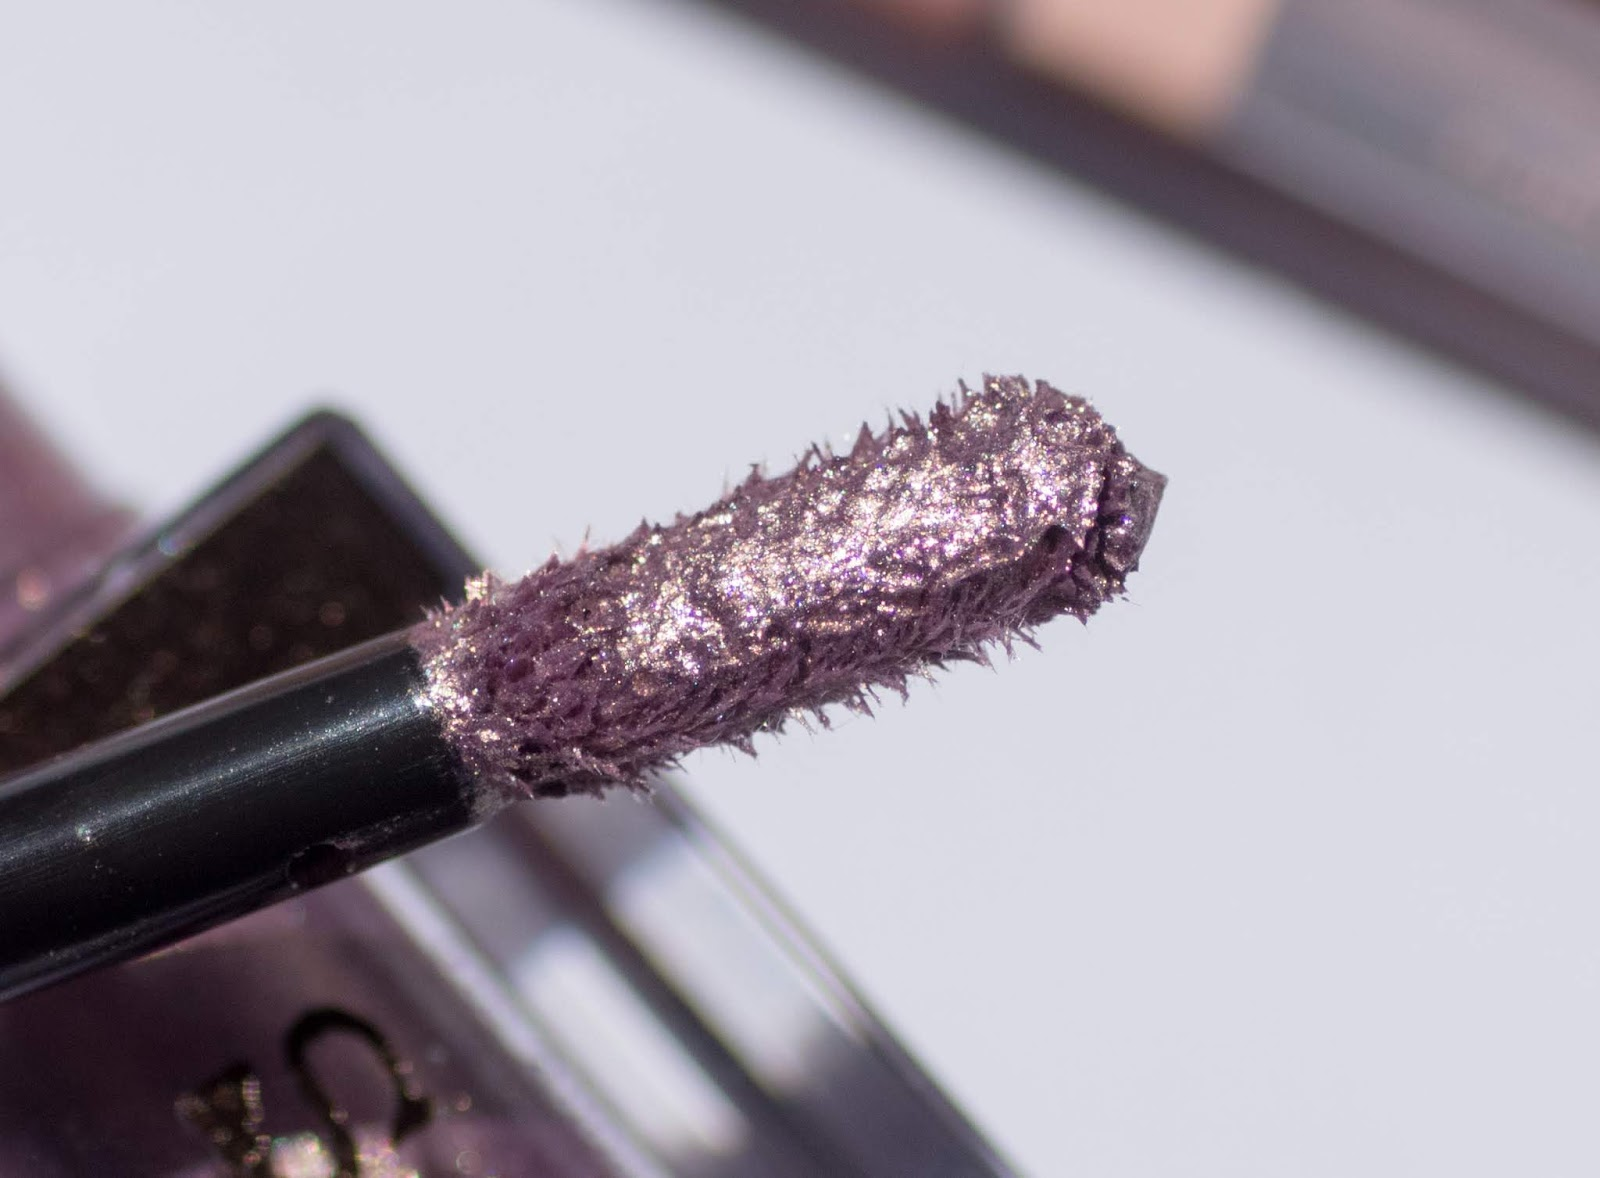 Stila Shimmer and Glow Liquid Eyeshadow in Cloud close up